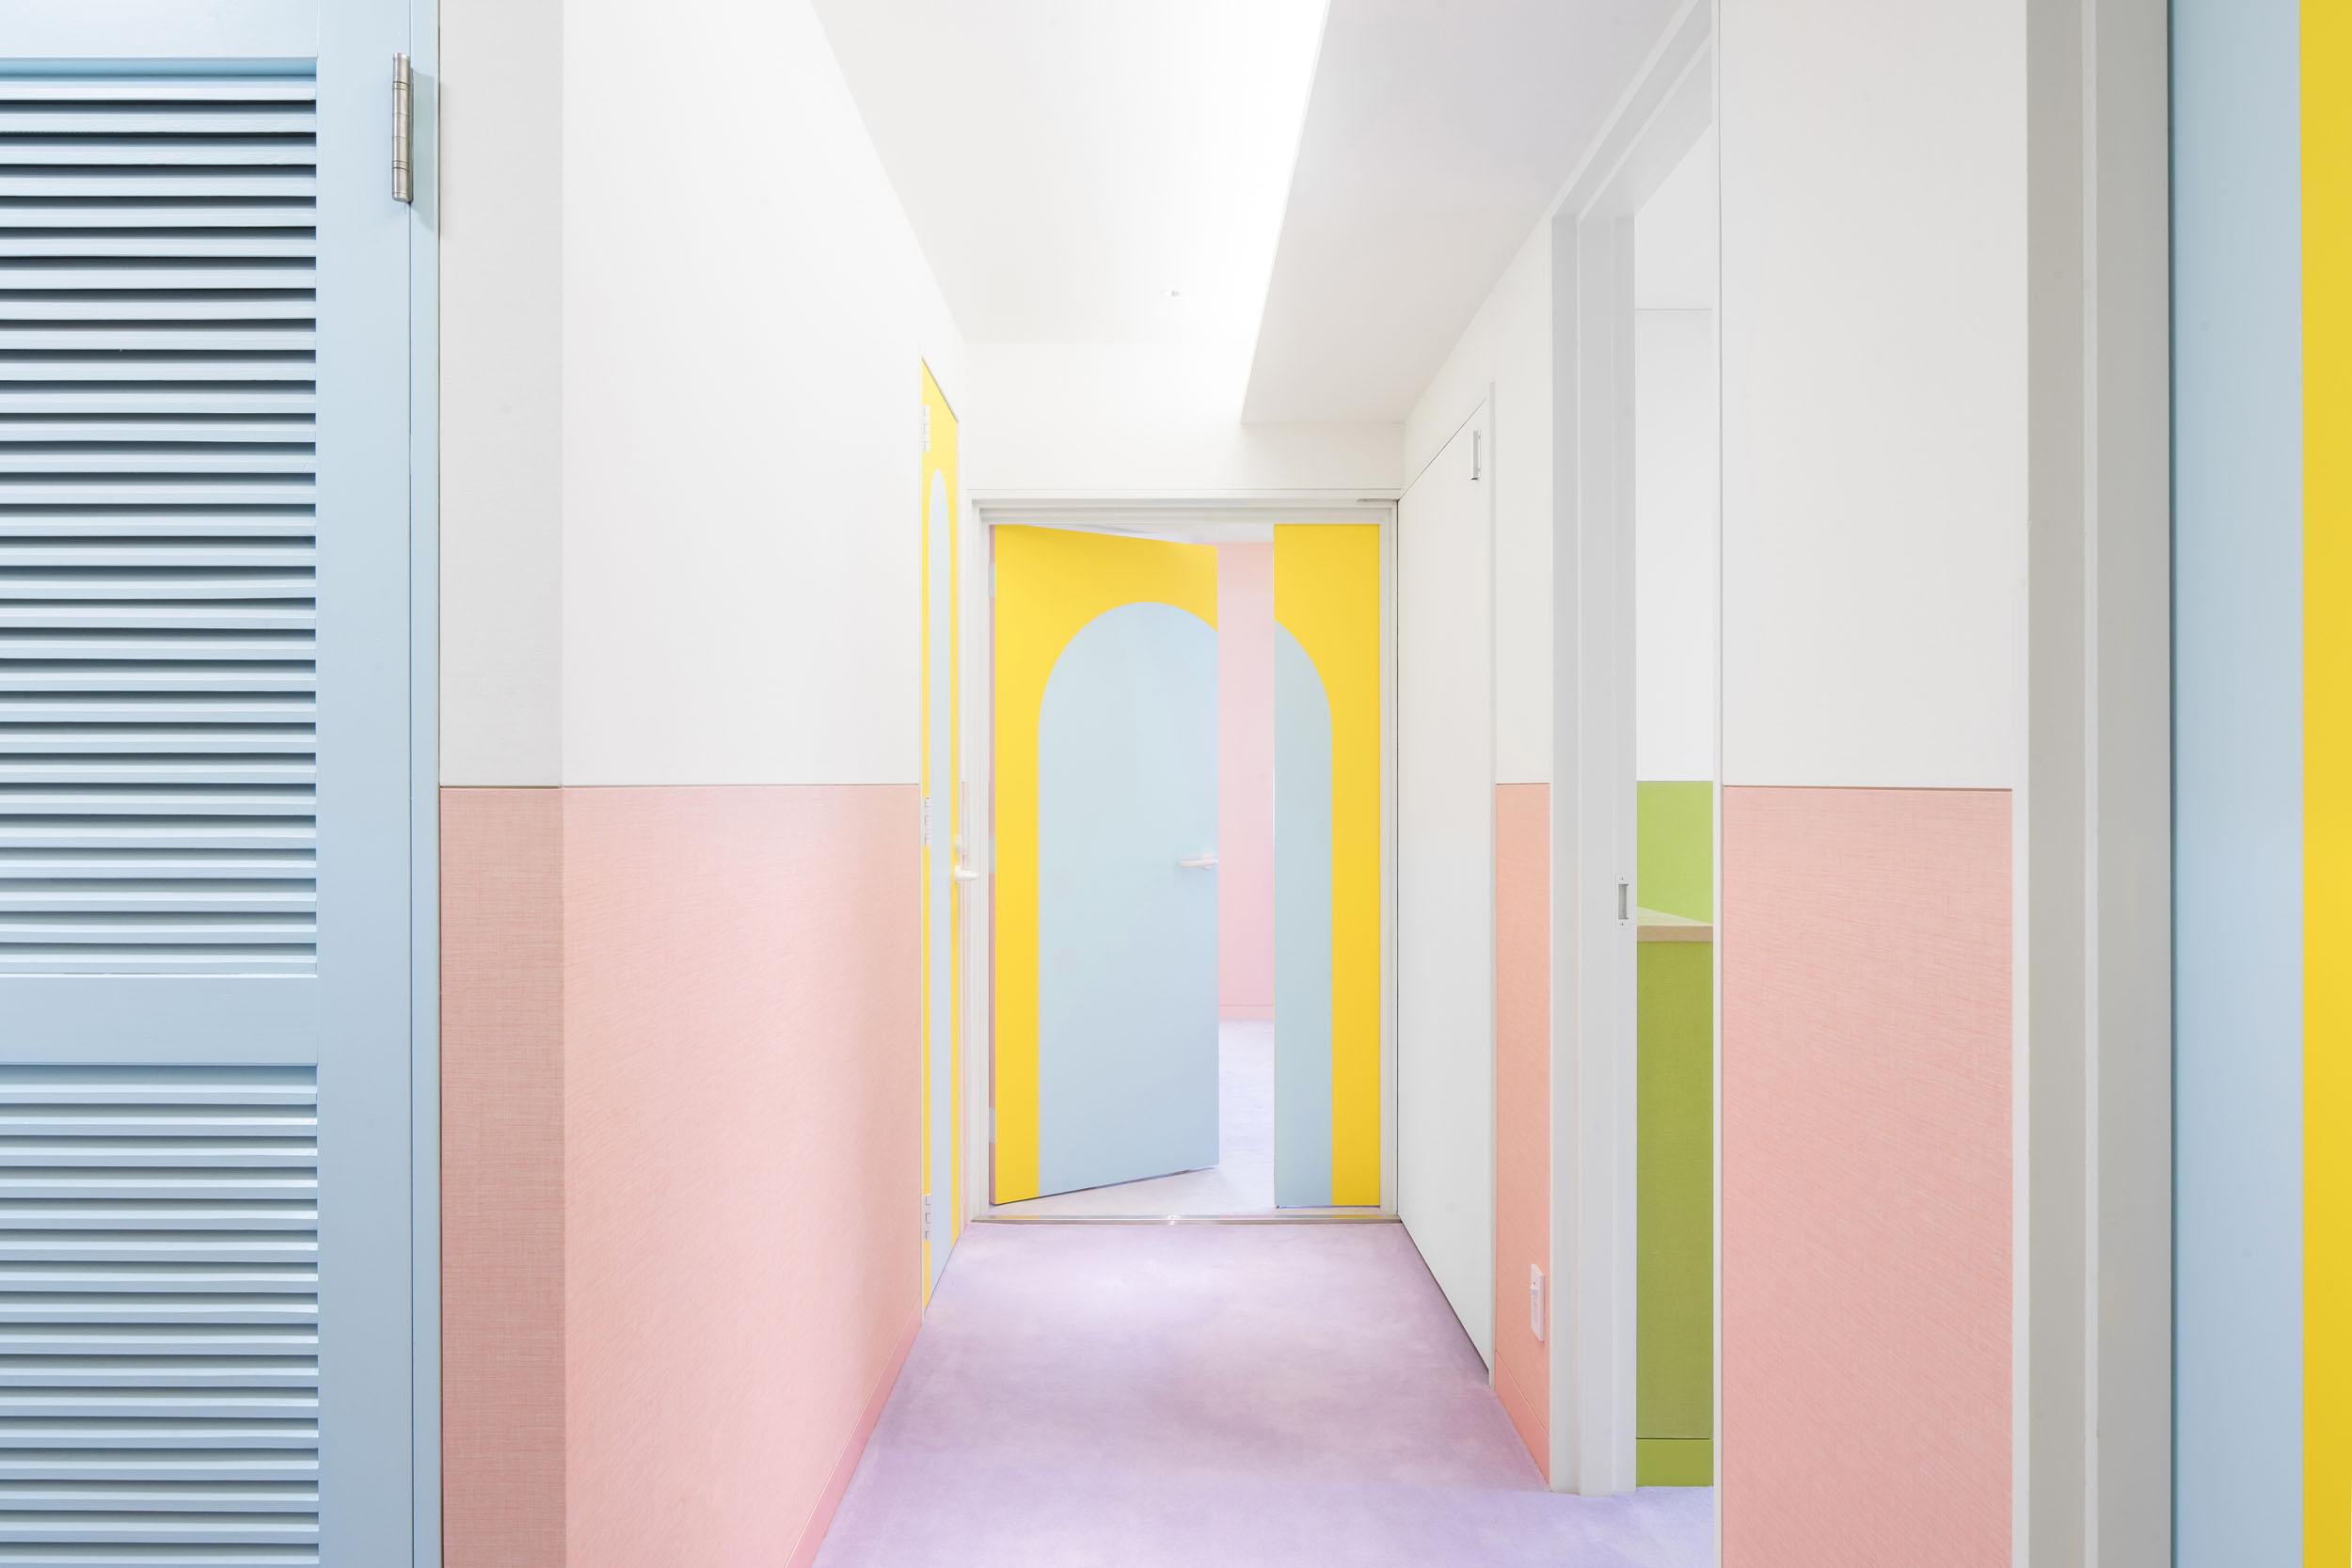 Nagatcho Apartment by Adam Nathaniel Furman in Tokyo, Japan, 2019. Image Source:  Adam Nathaniel Furman